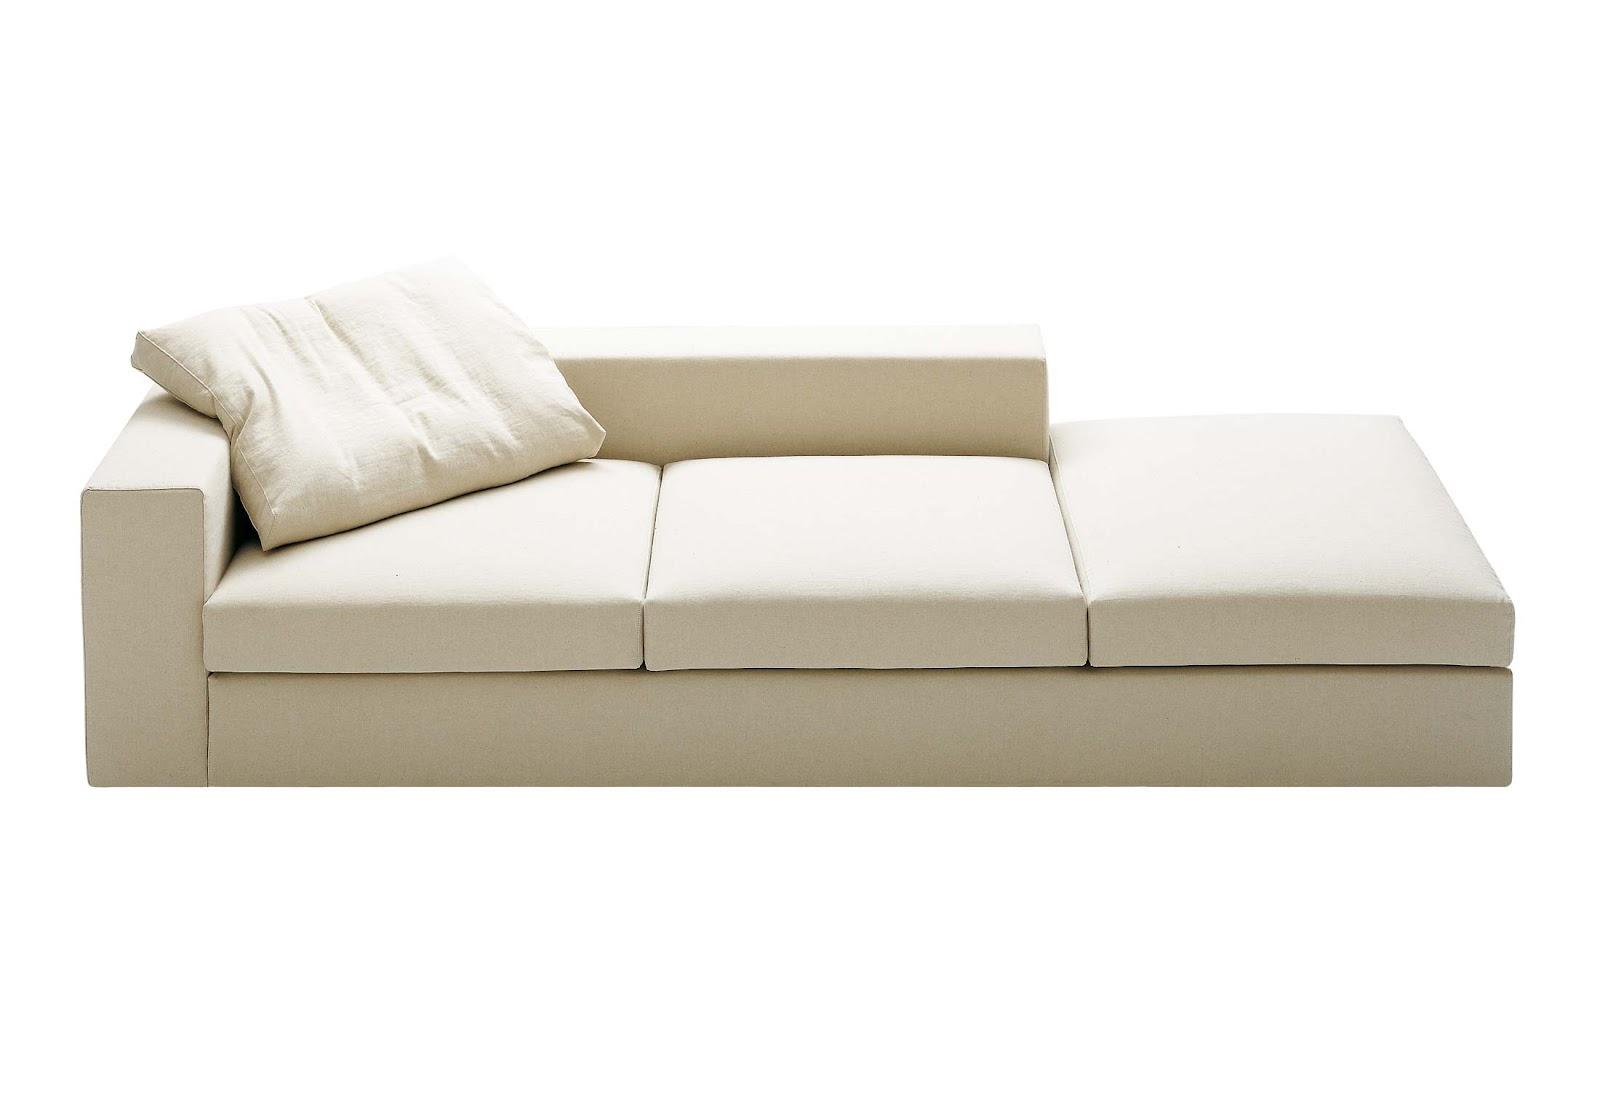 zanotta sofa bed pottery barn grand slipcovers beta by designer furniture fitted